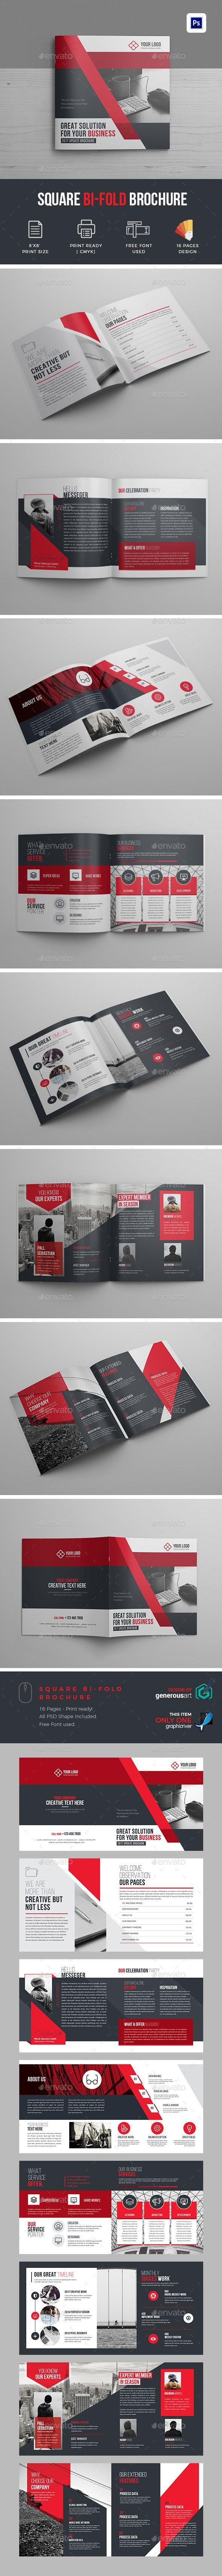 Creative Square Bi-Fold Brochure Template - #Brochures Print #Templates Download here: https://graphicriver.net/item/creative-square-bifold-brochure-template/19458302?ref=alena994